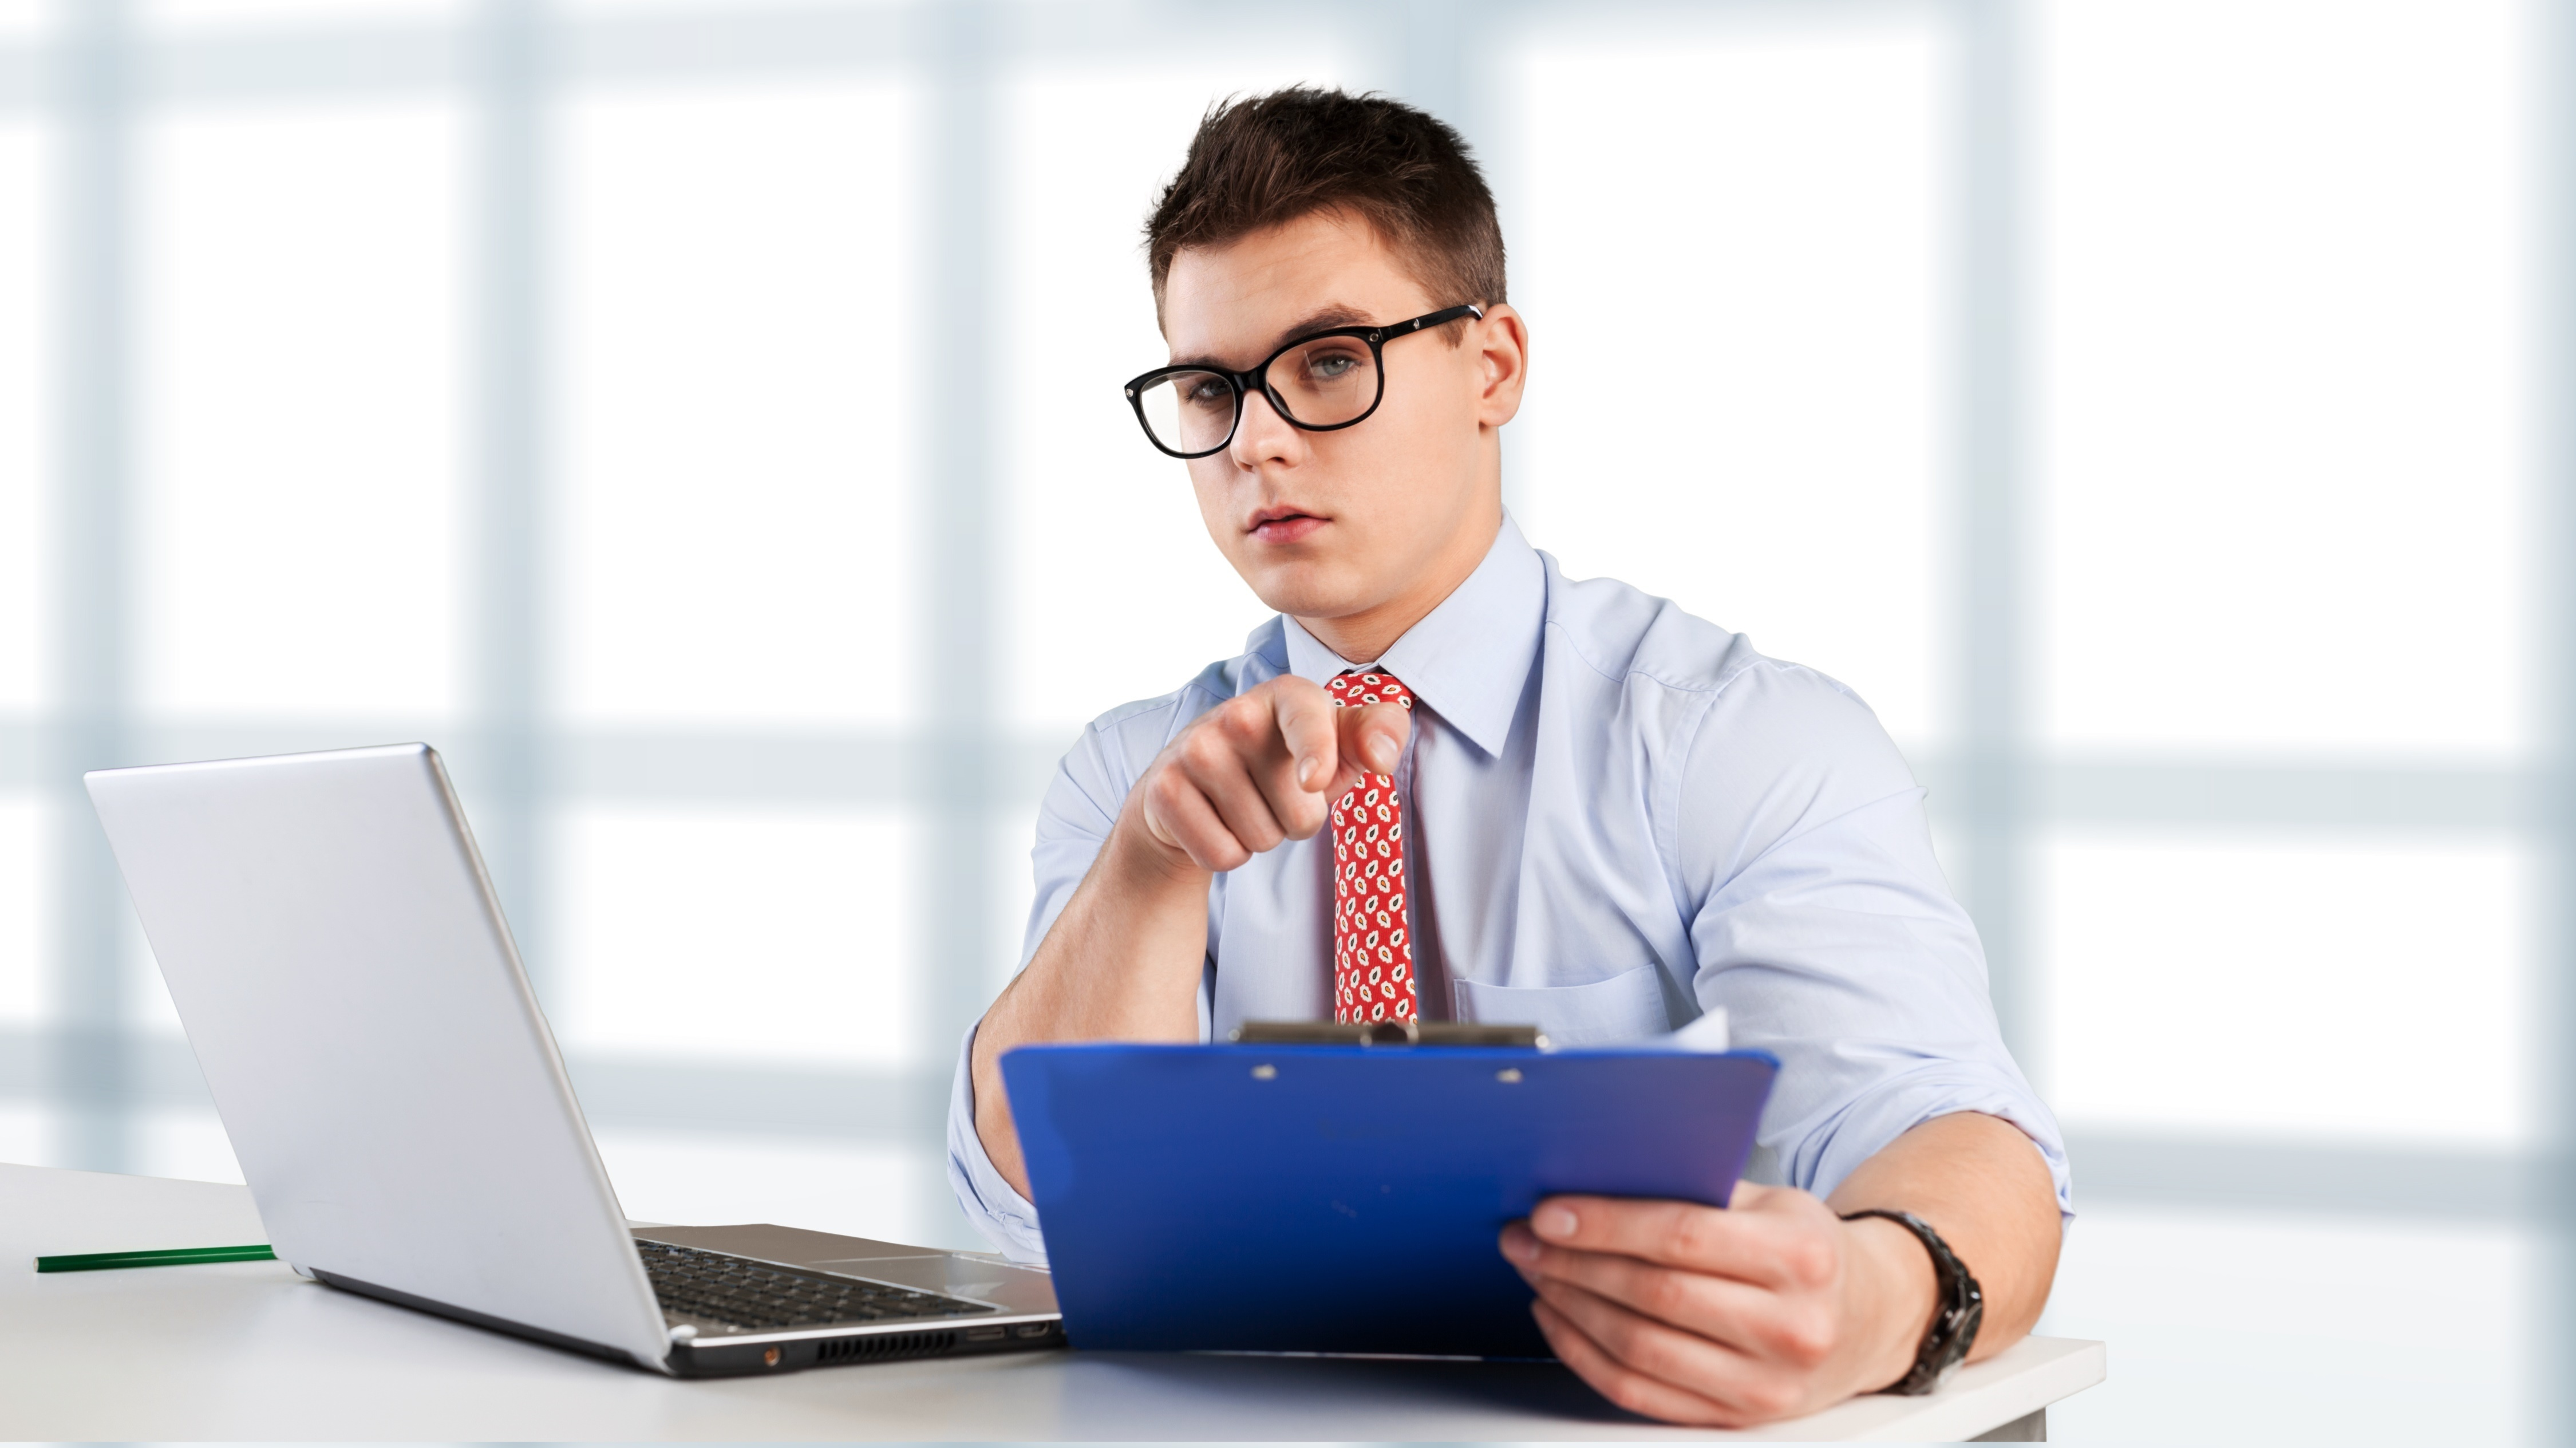 Laptop, glasses, hipster.